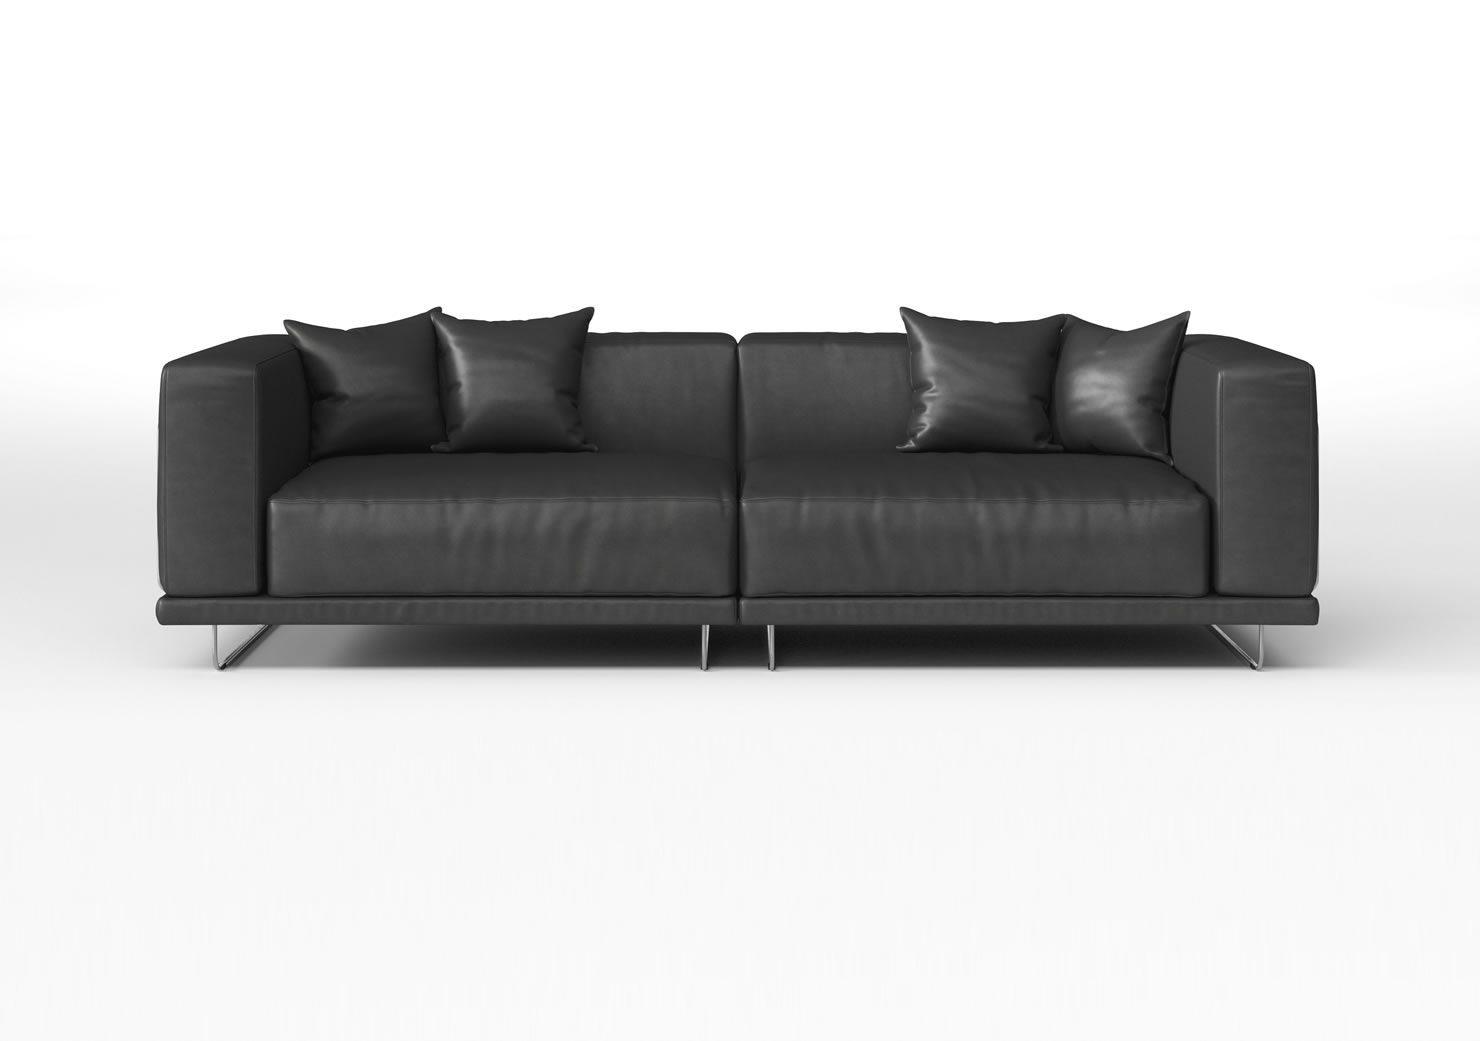 IKEA Tylosand ソファガイド